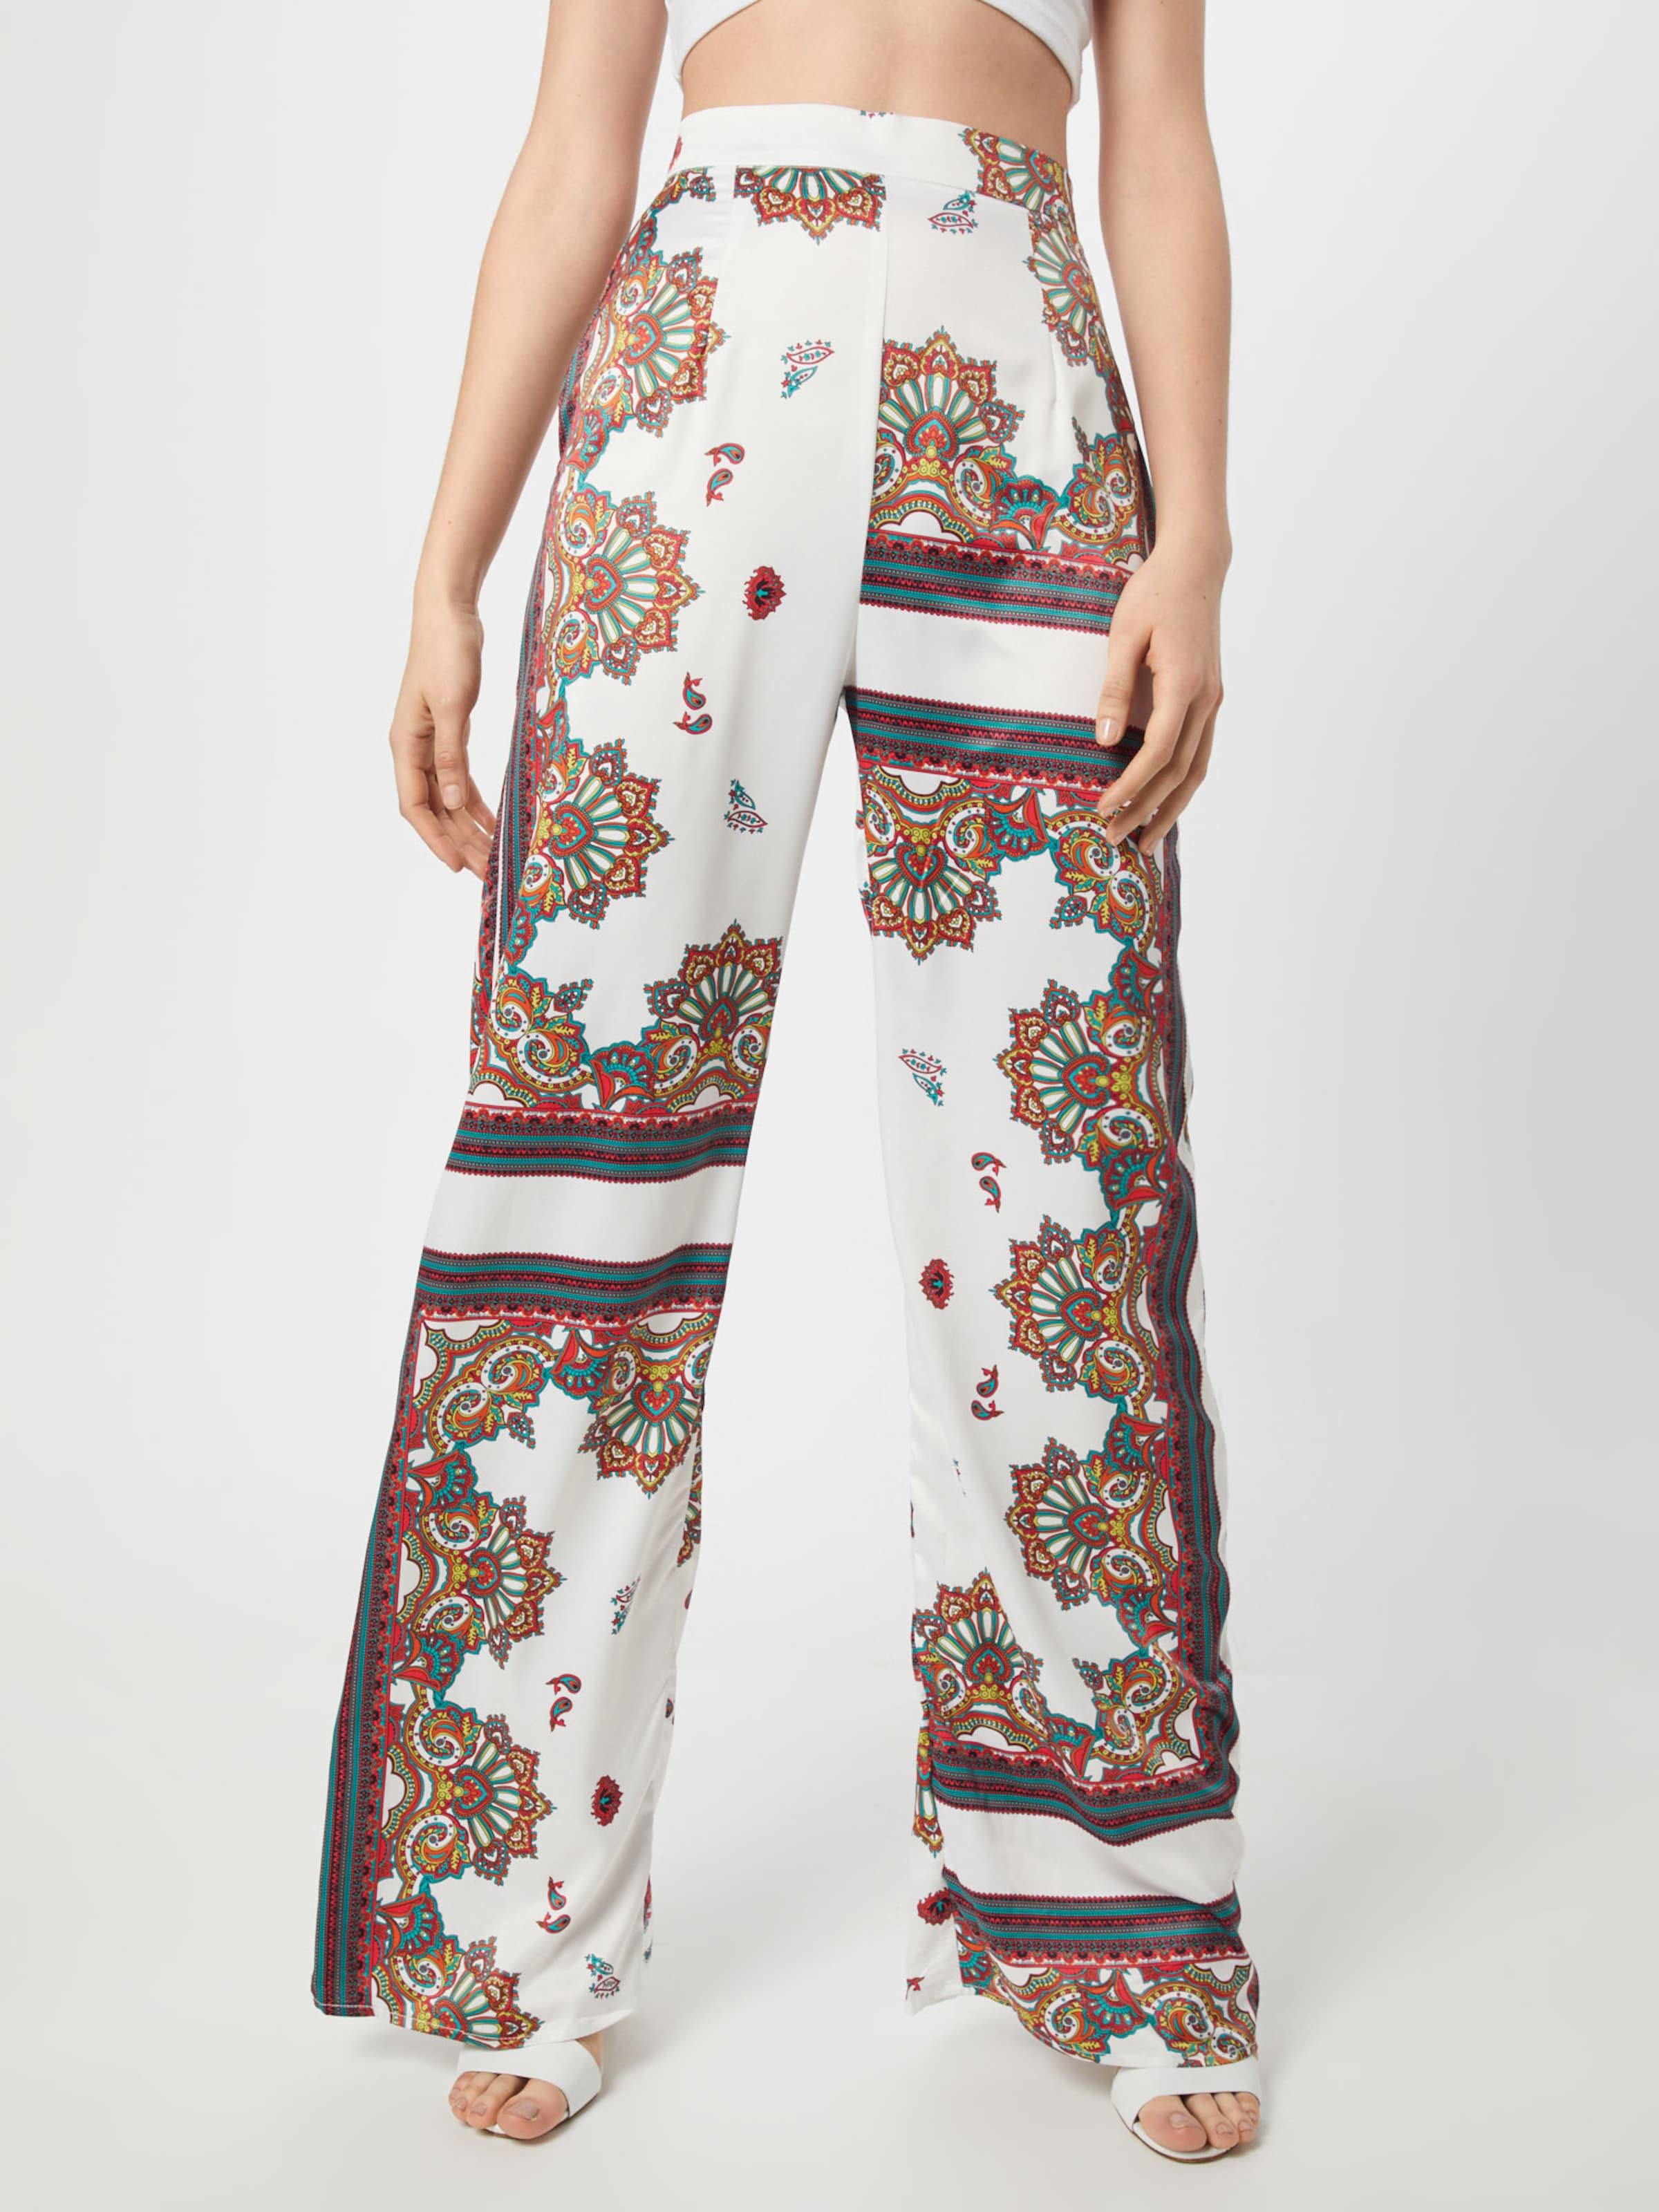 Missguided Pantalon Blanc Pantalon Missguided Missguided Pantalon En En Blanc Pantalon En Blanc Missguided xWdCBore